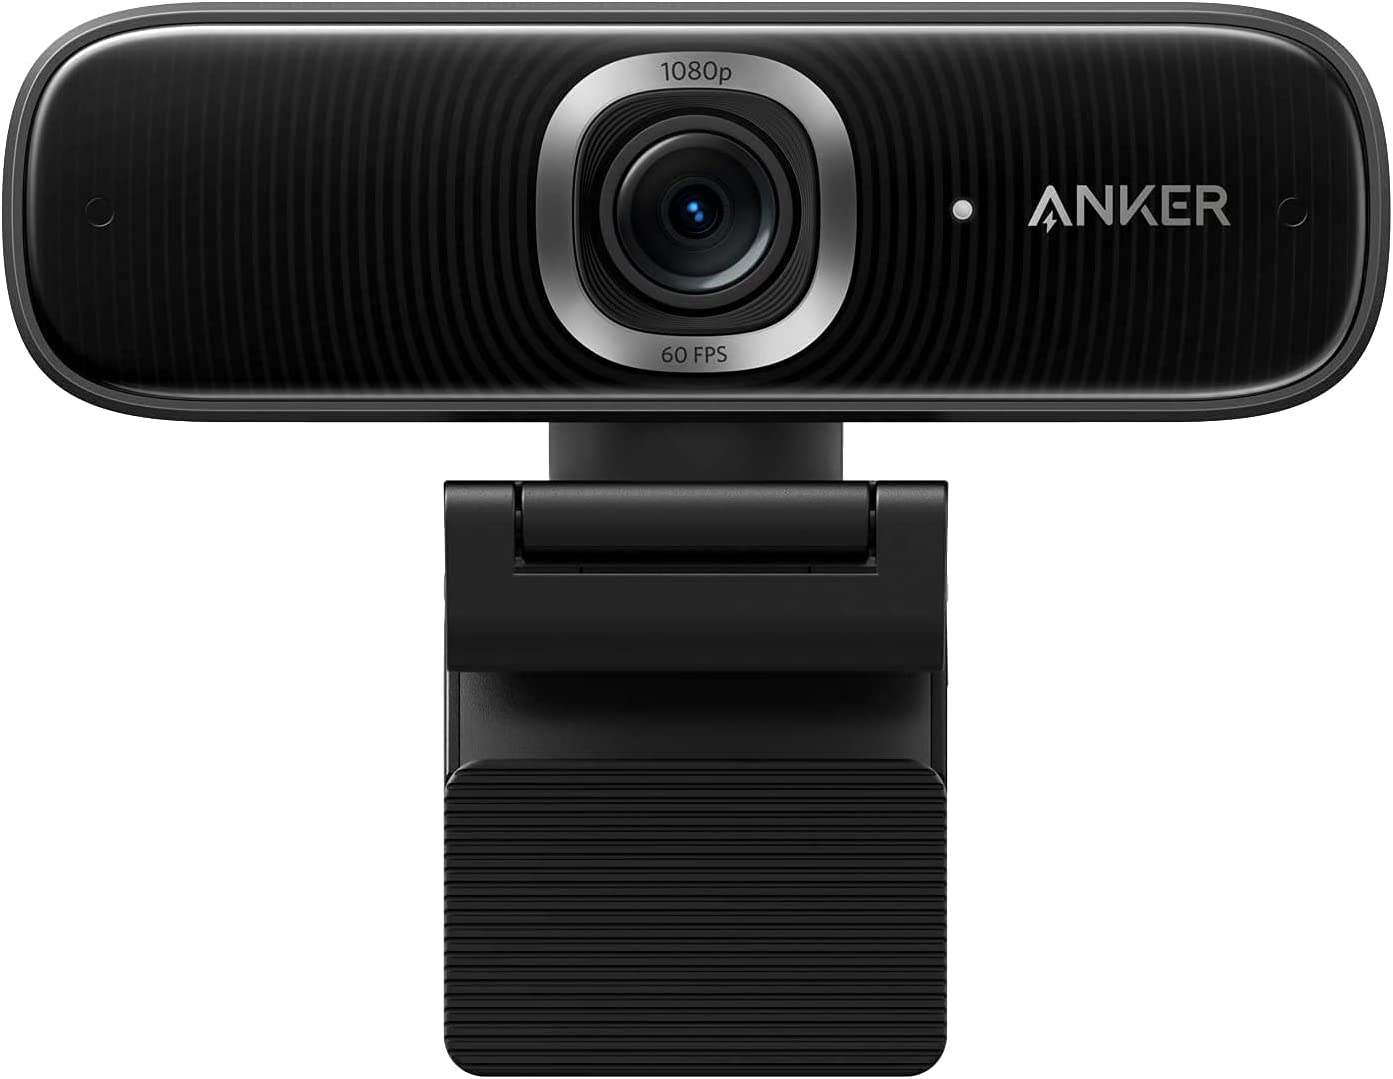 Anker PowerConf C300 ウェブカメラ AI機能搭載 フル HD モーショントラッキング 高速オートフォーカス 1080p 高画質 ノイズリダクション オートゲインコントロール 画角調節機能 プライバシーカバー Zoom認証